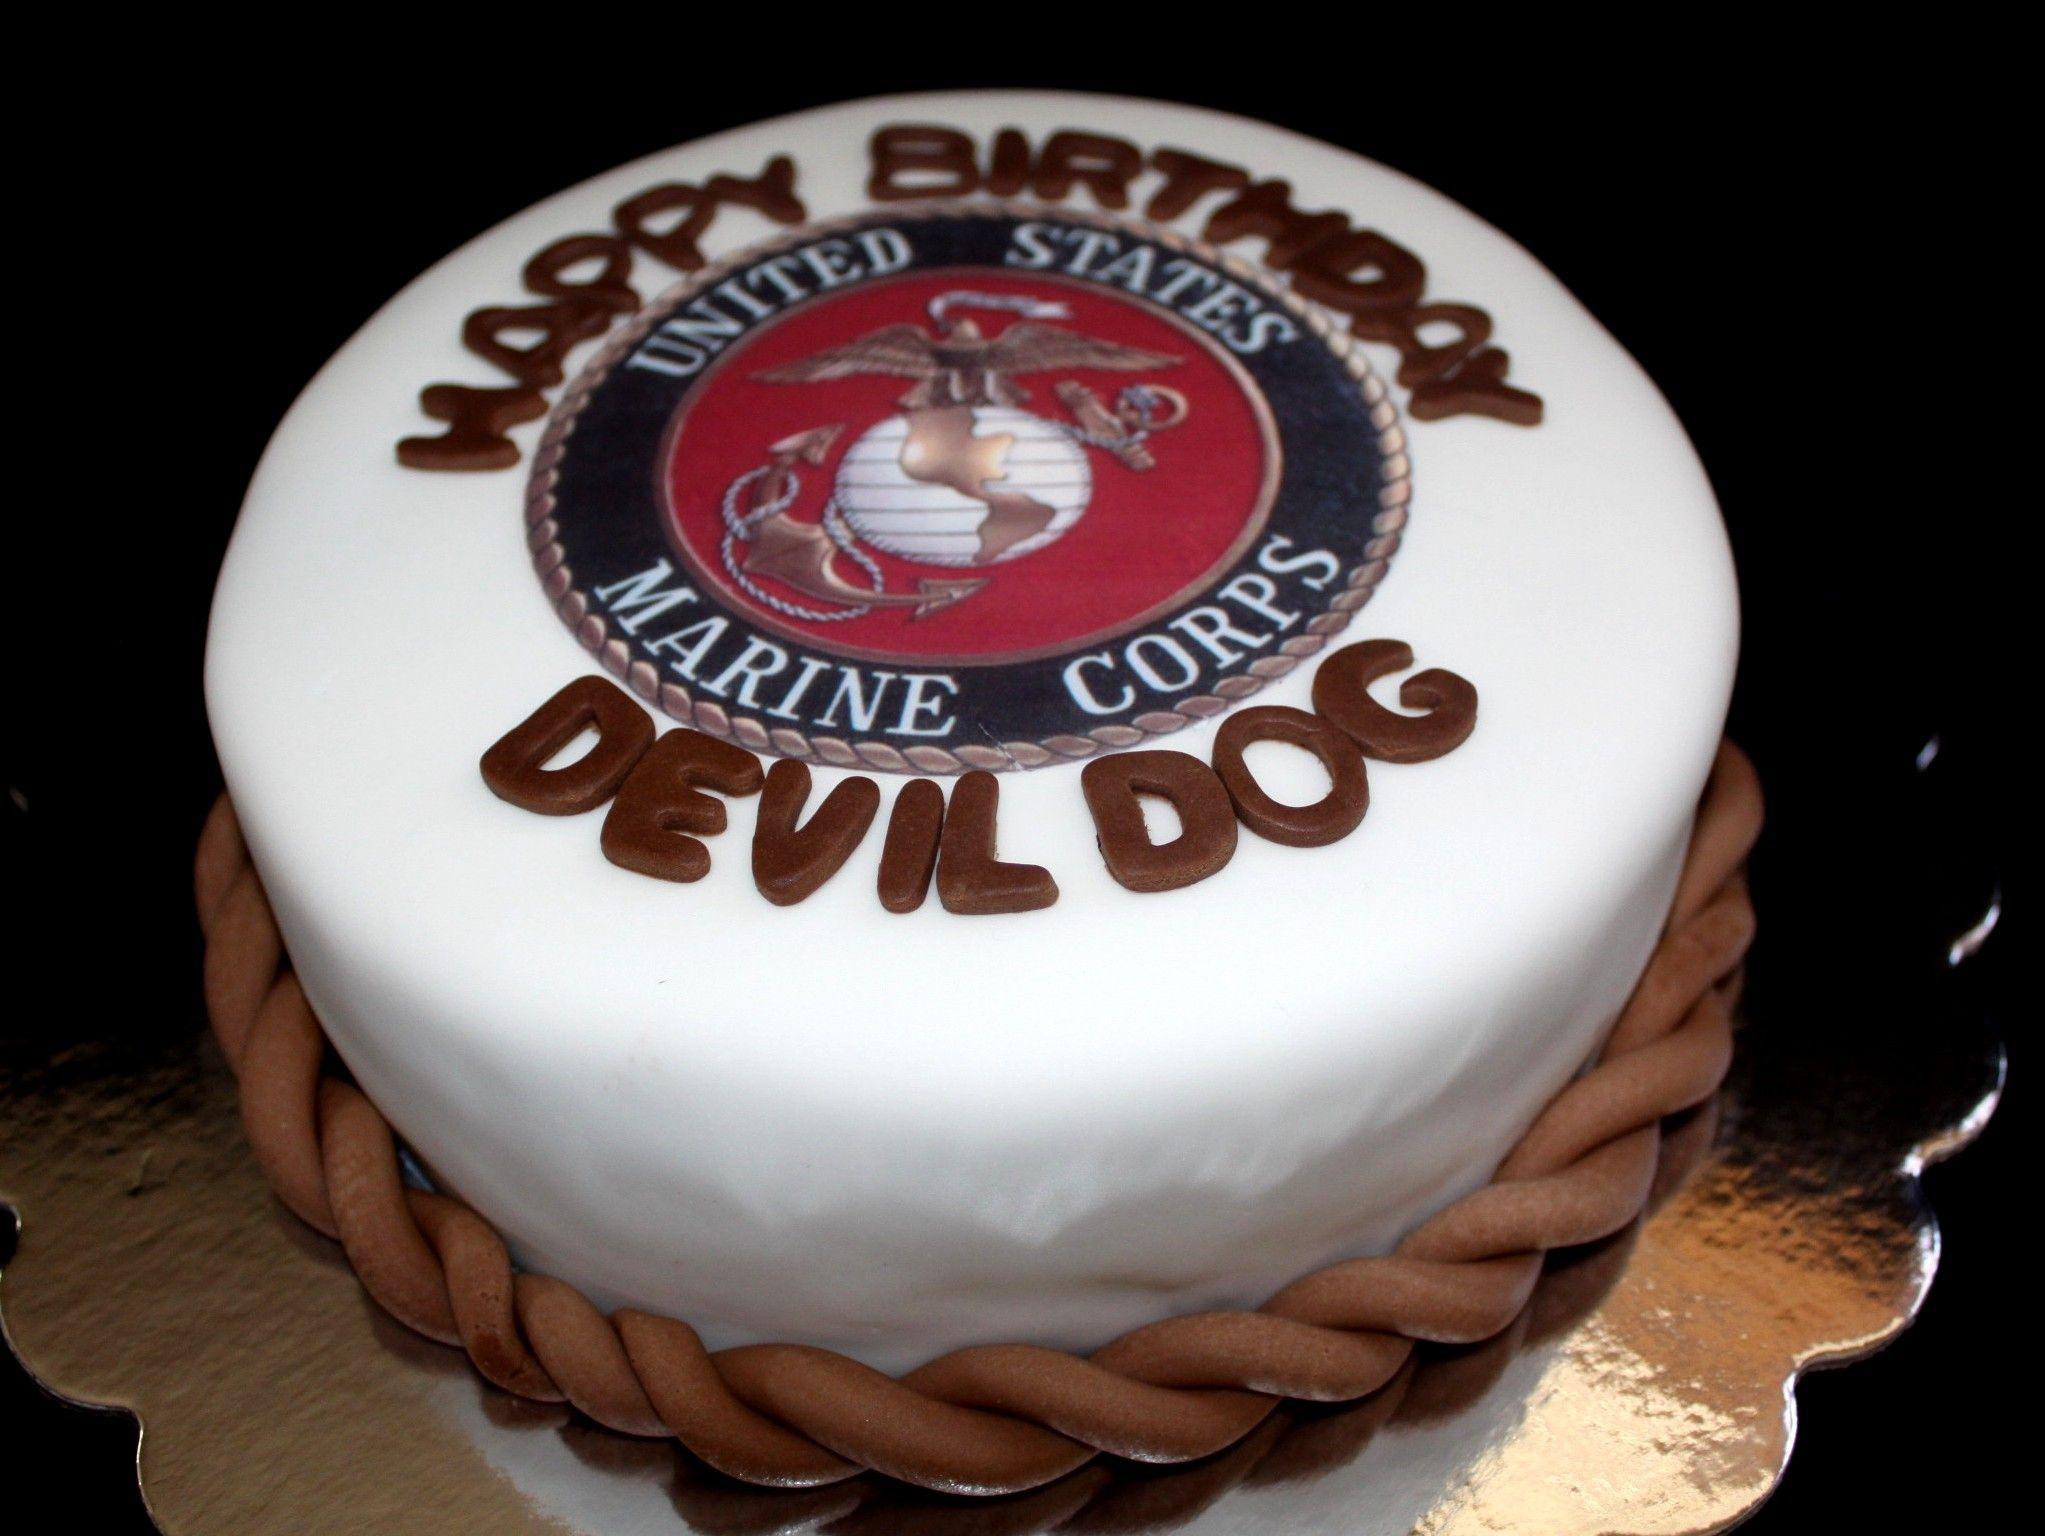 Marine Corp Cake! OohRah Devil Dog